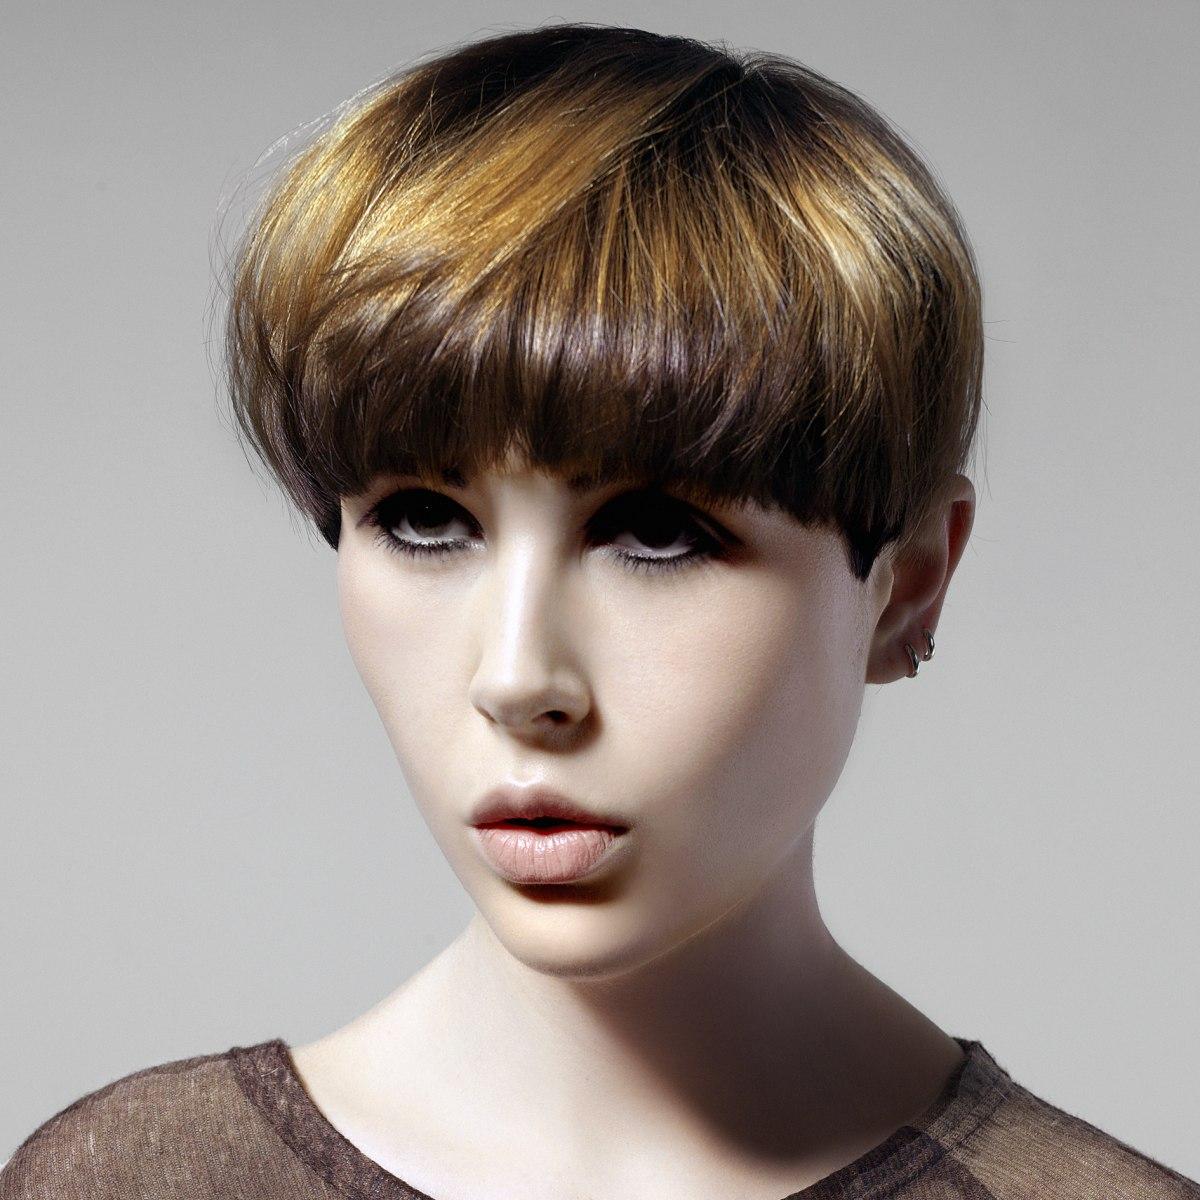 Miraculous Beautiful Minimalistic Short Hairstyles With Elegant Silhouettes Schematic Wiring Diagrams Phreekkolirunnerswayorg